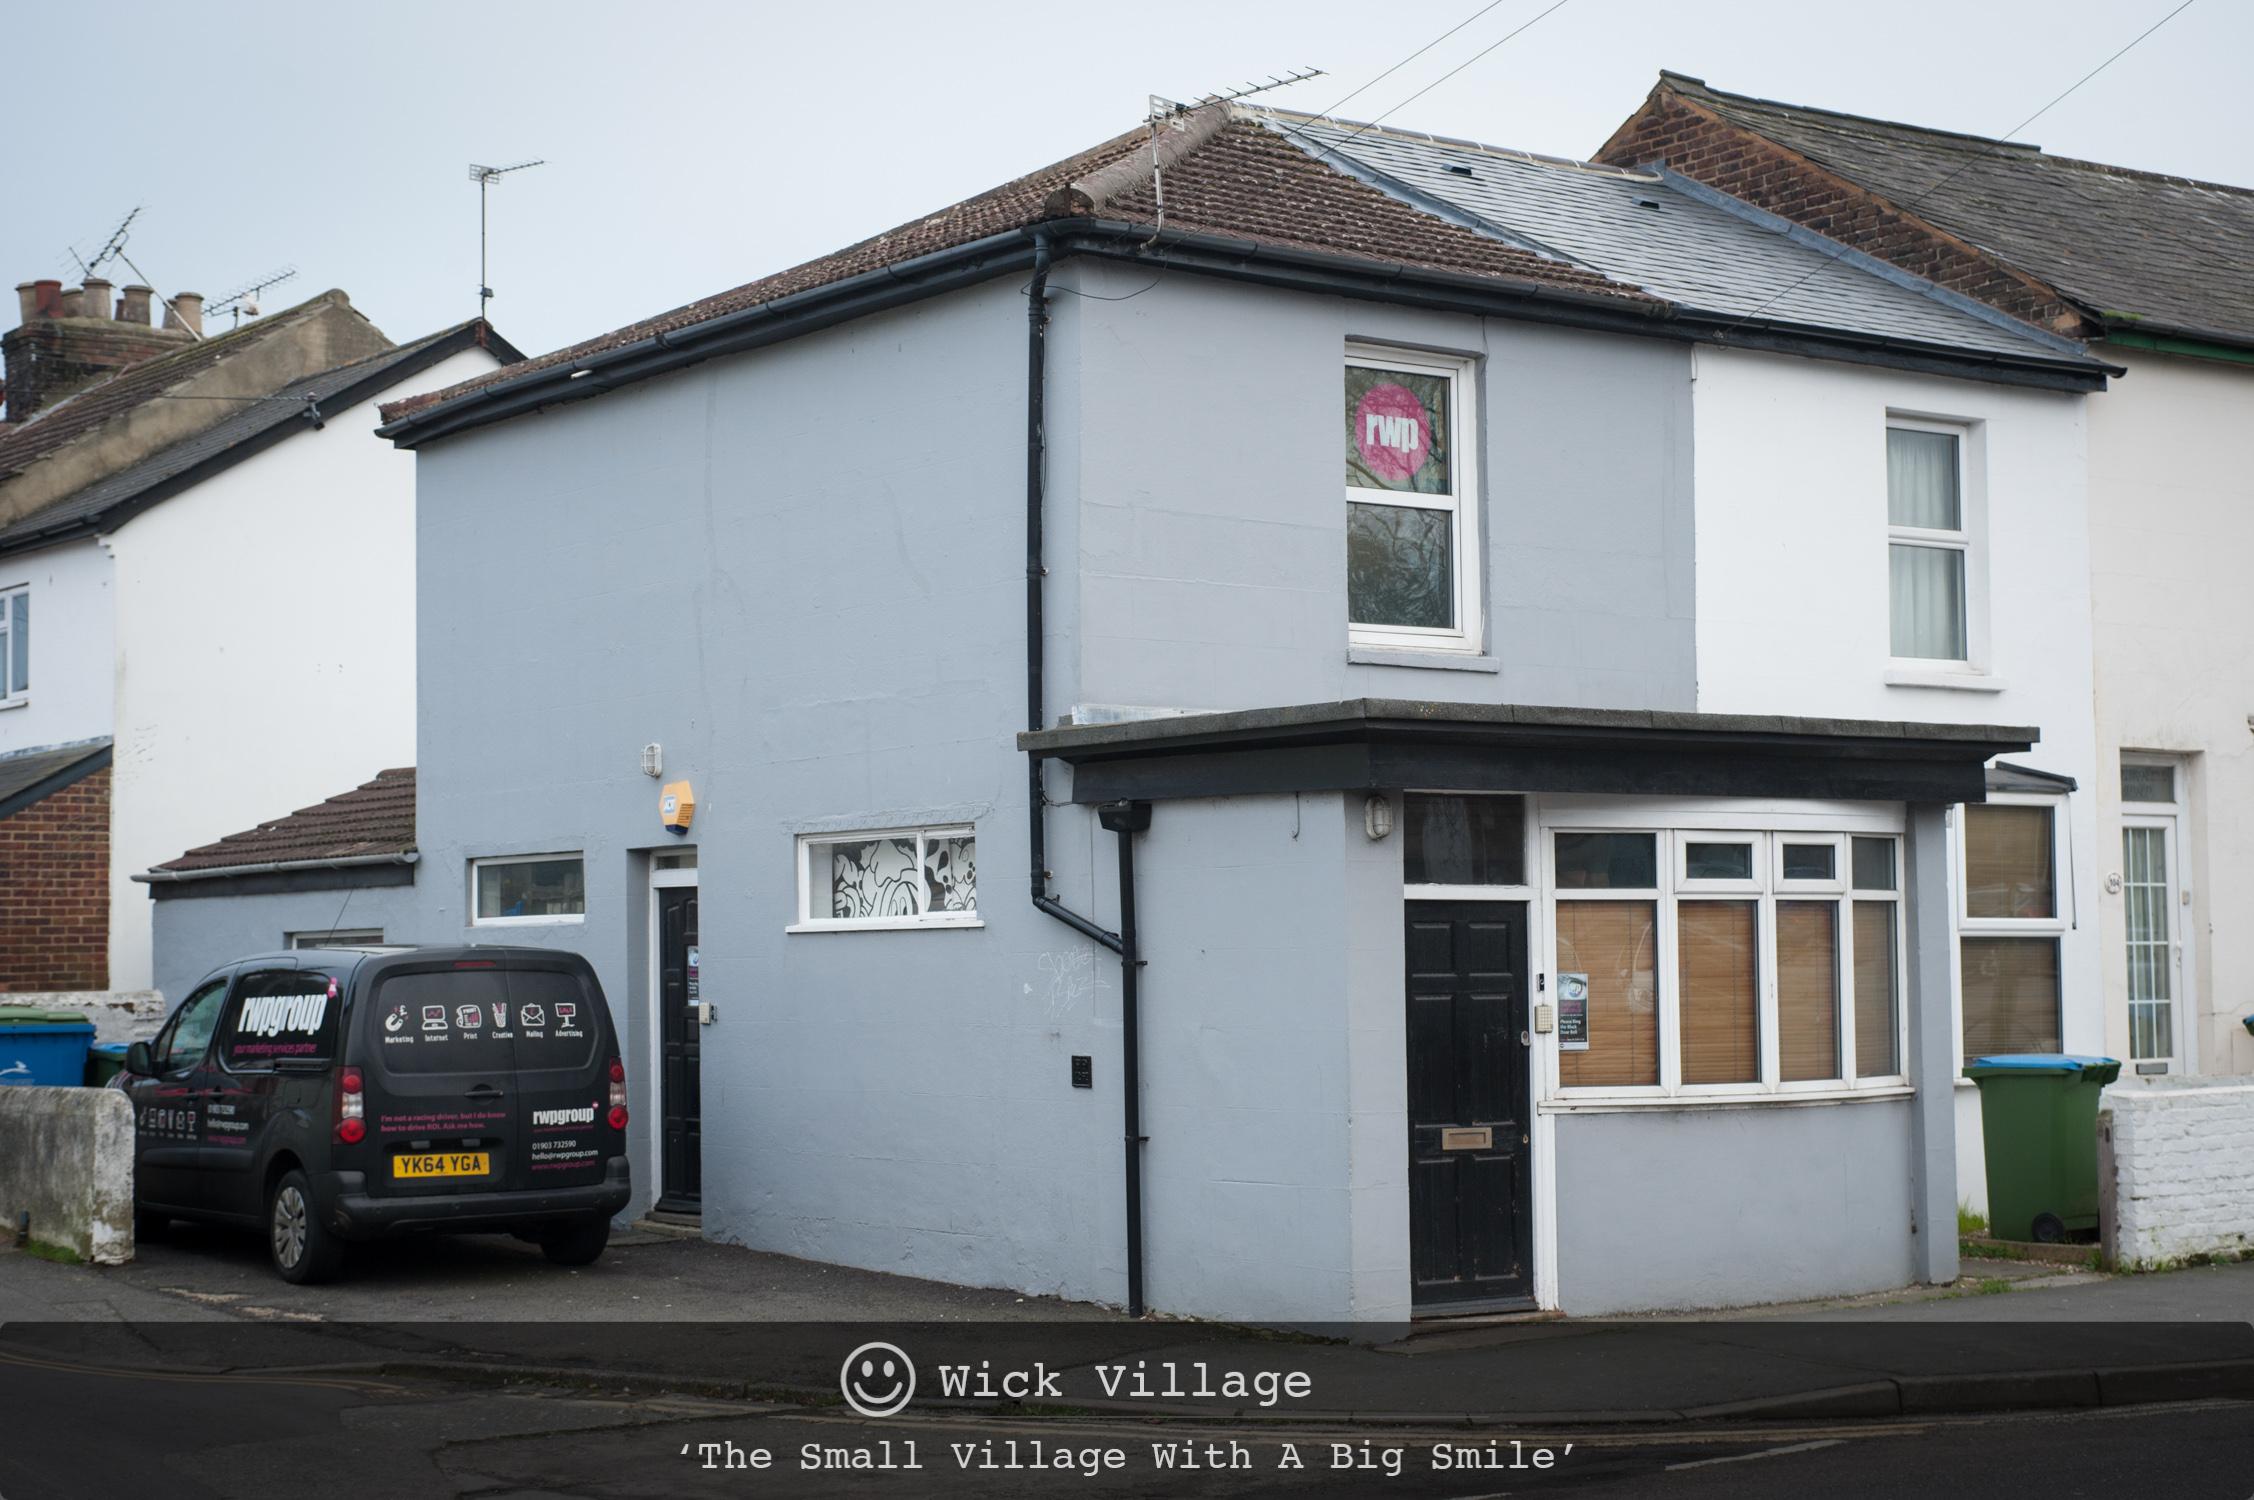 RWP Group, Wick Village, Littlehampton.